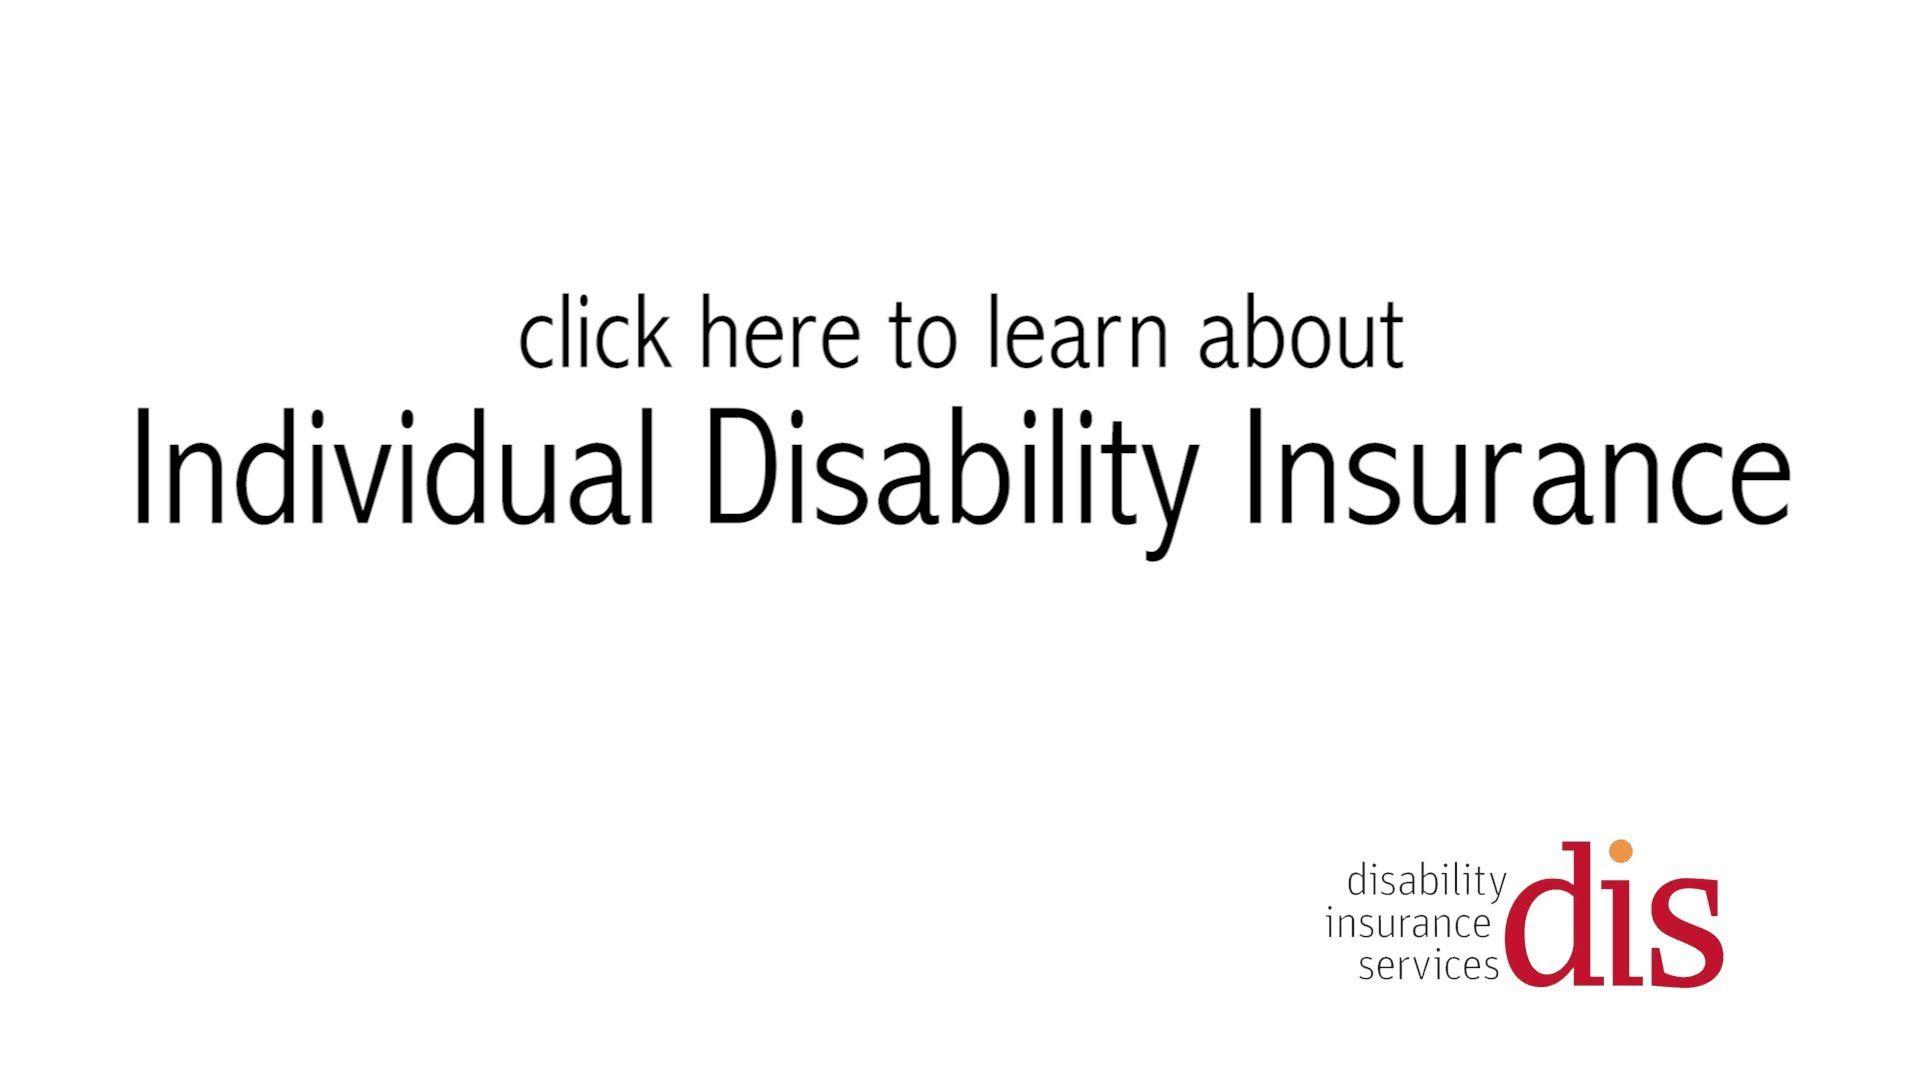 Individual Disability Insurance Disability Insurance Insurance